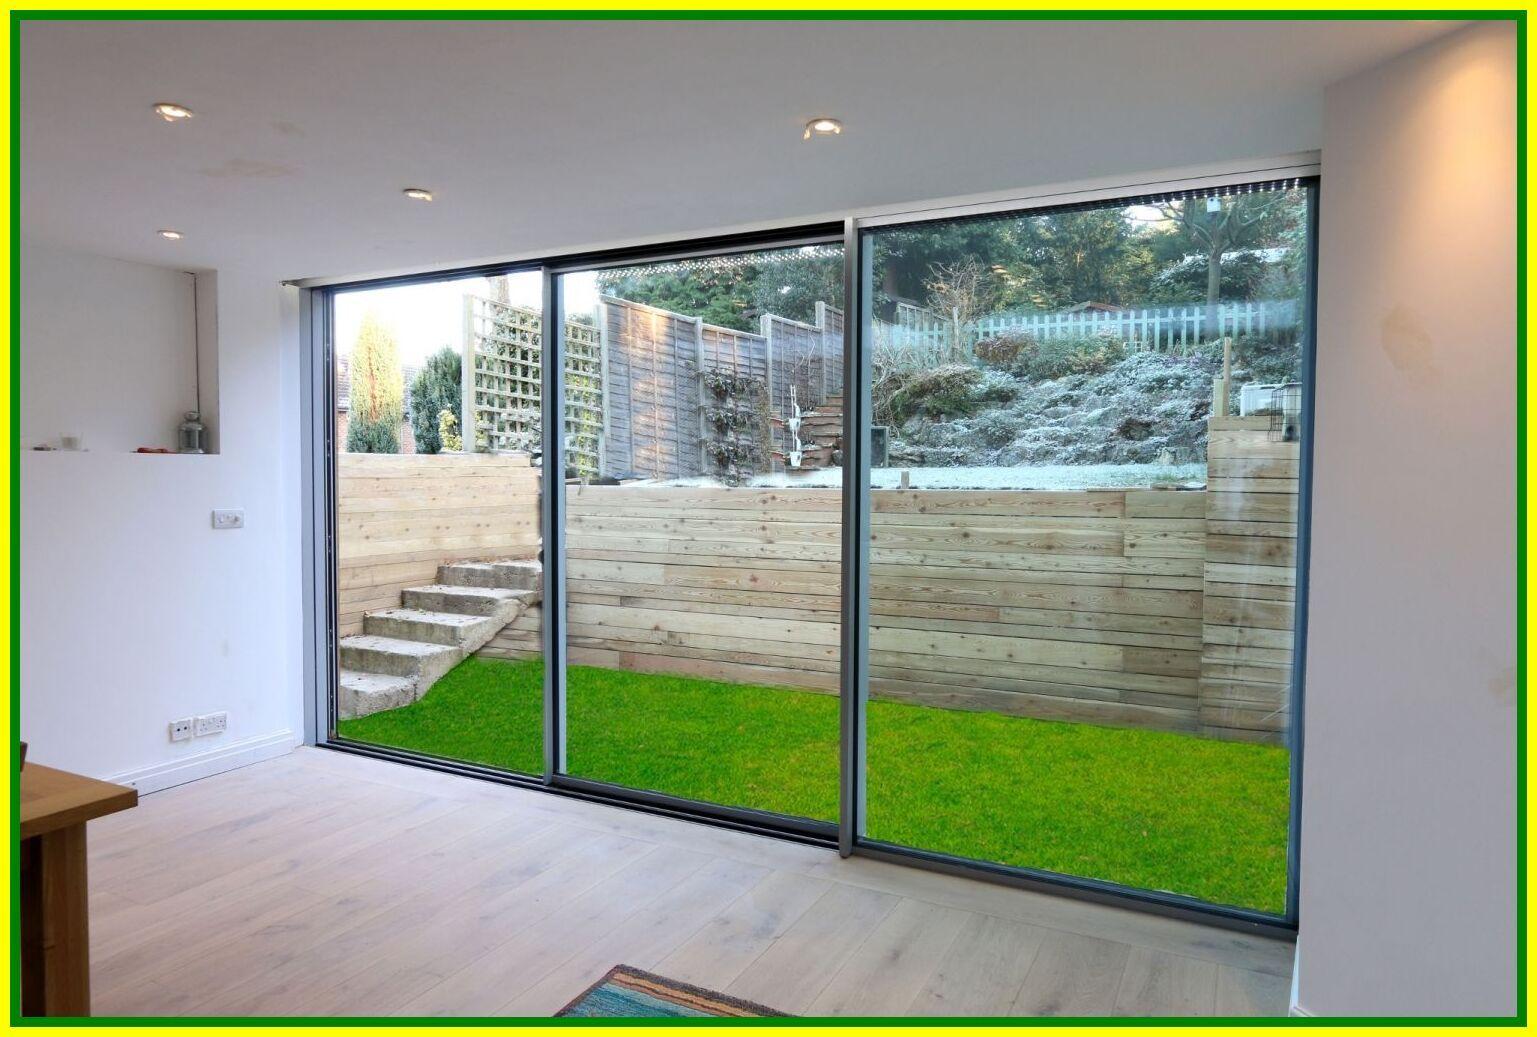 46 Reference Of Slimline Patio Doors Aluminium In 2020 Patio Doors Aluminium Sliding Doors Custom Sliding Doors